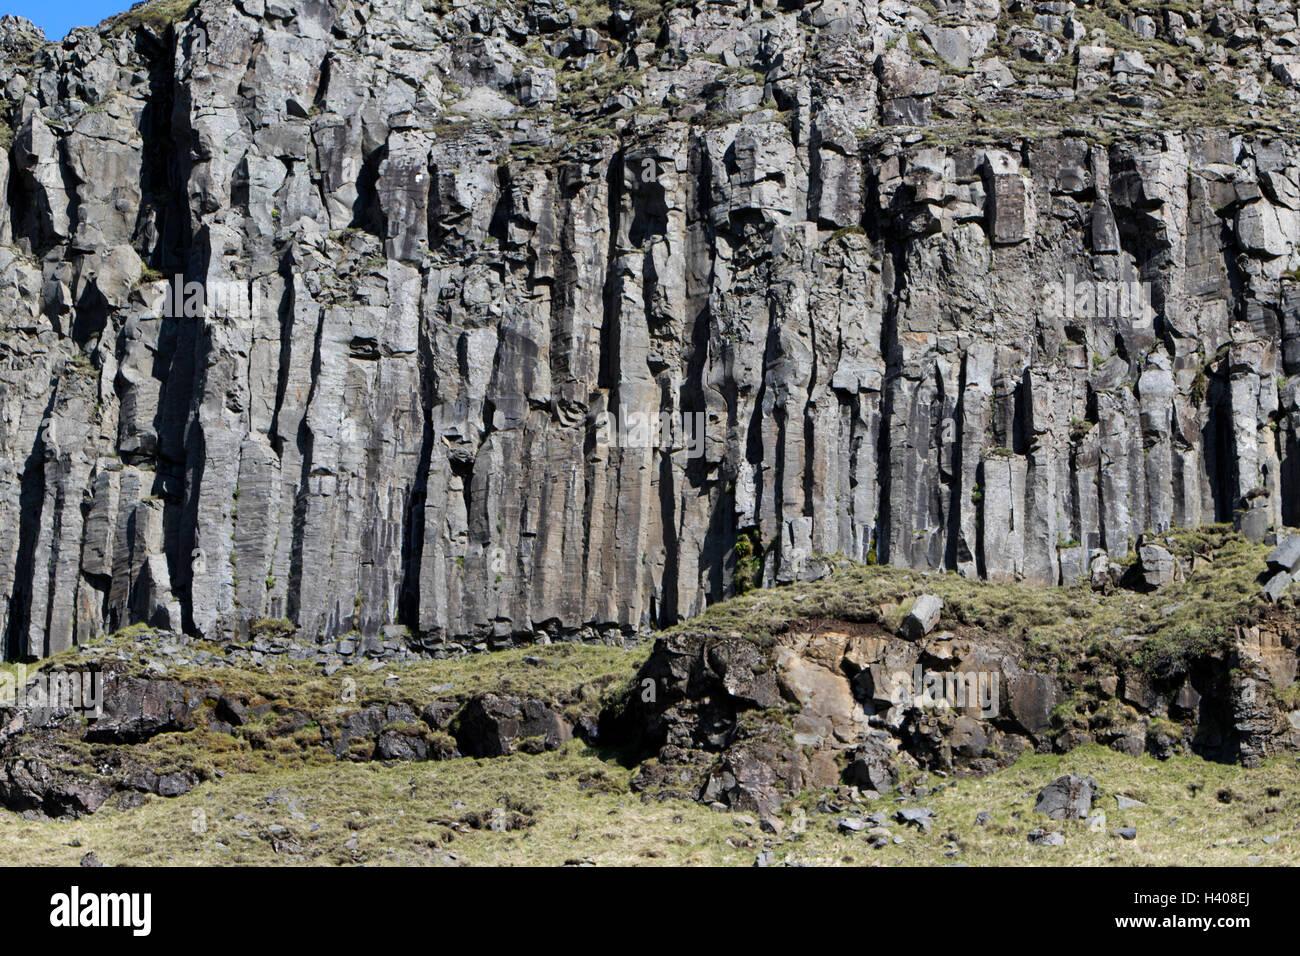 Basalt Säulen vulkanischen Felsformationen in Klippen in der Nähe von Sea Island Stockbild